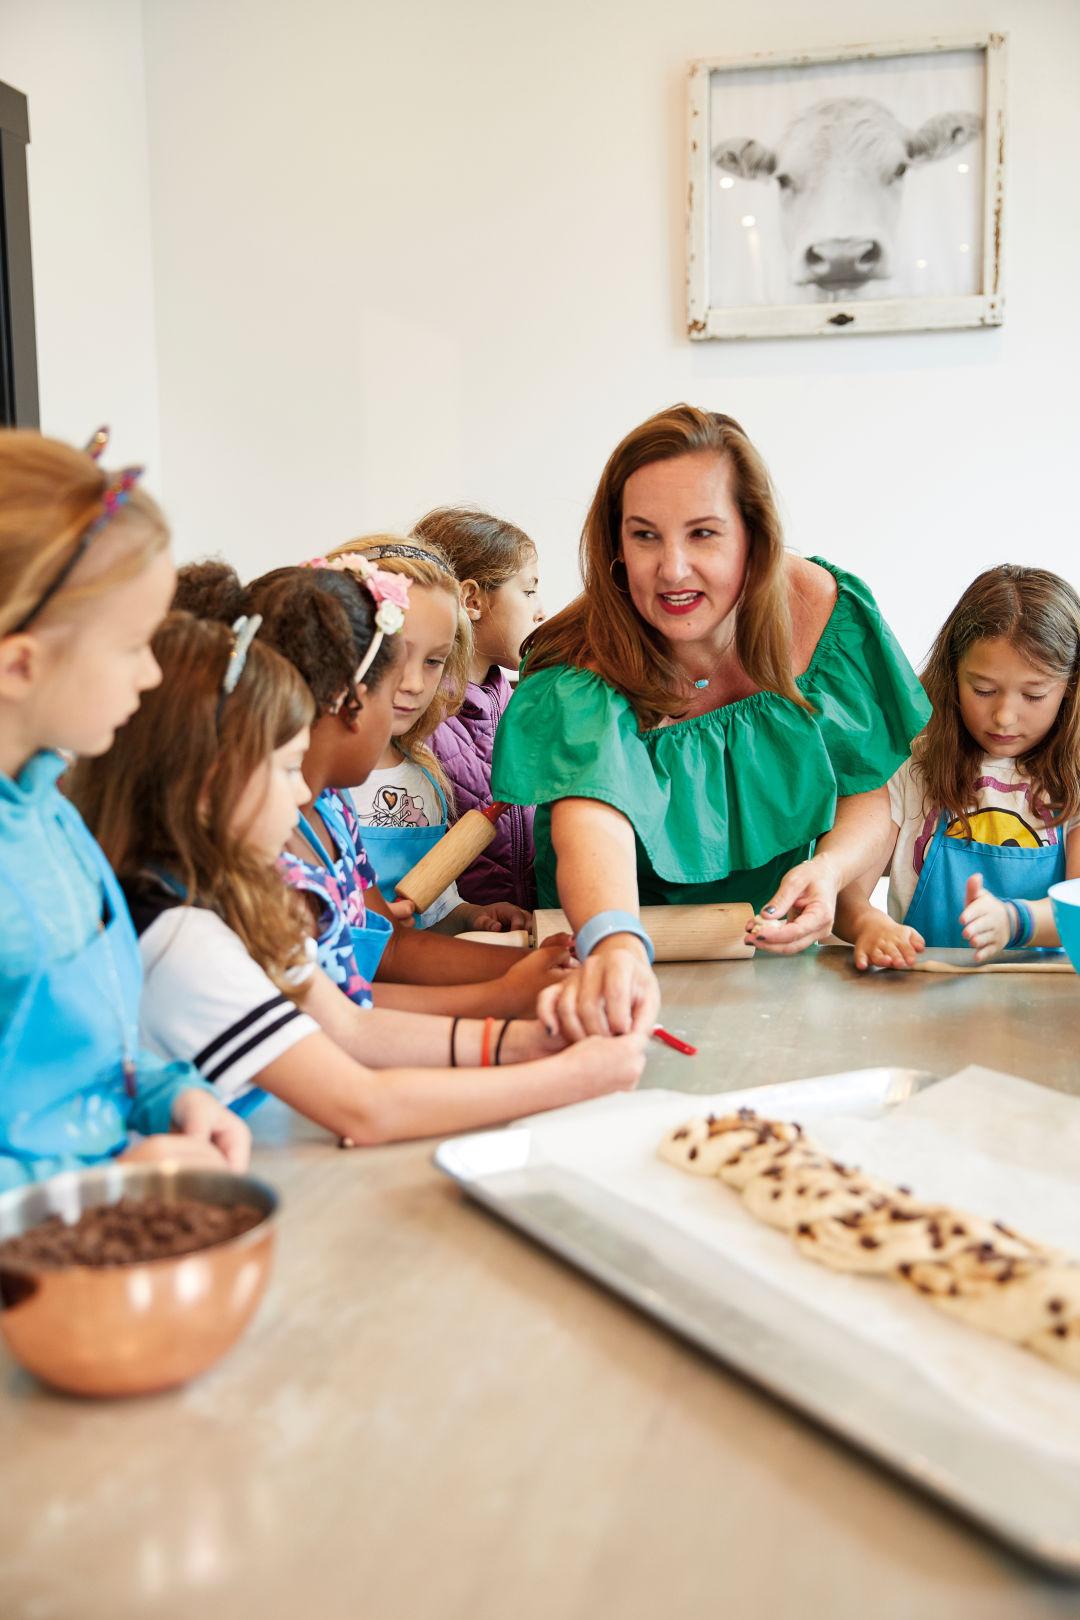 Kids Parties That Don't Make Parents Gag | Seattle Met